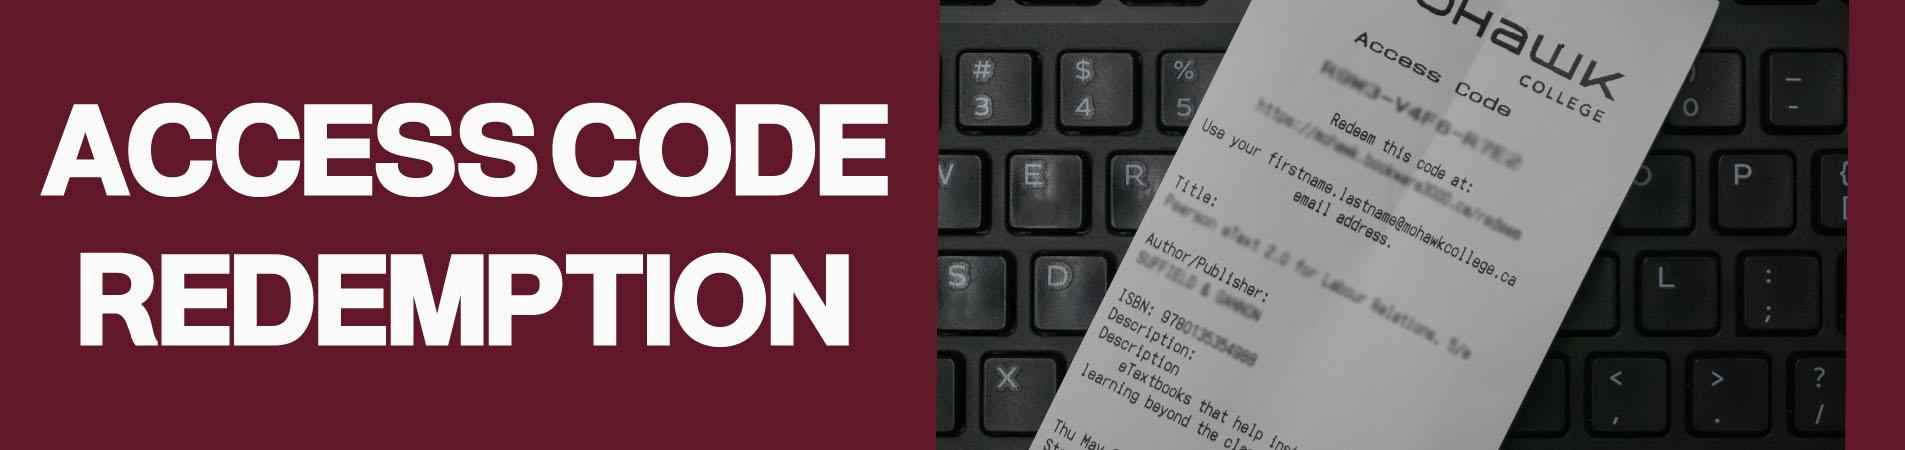 Access Code Redemption